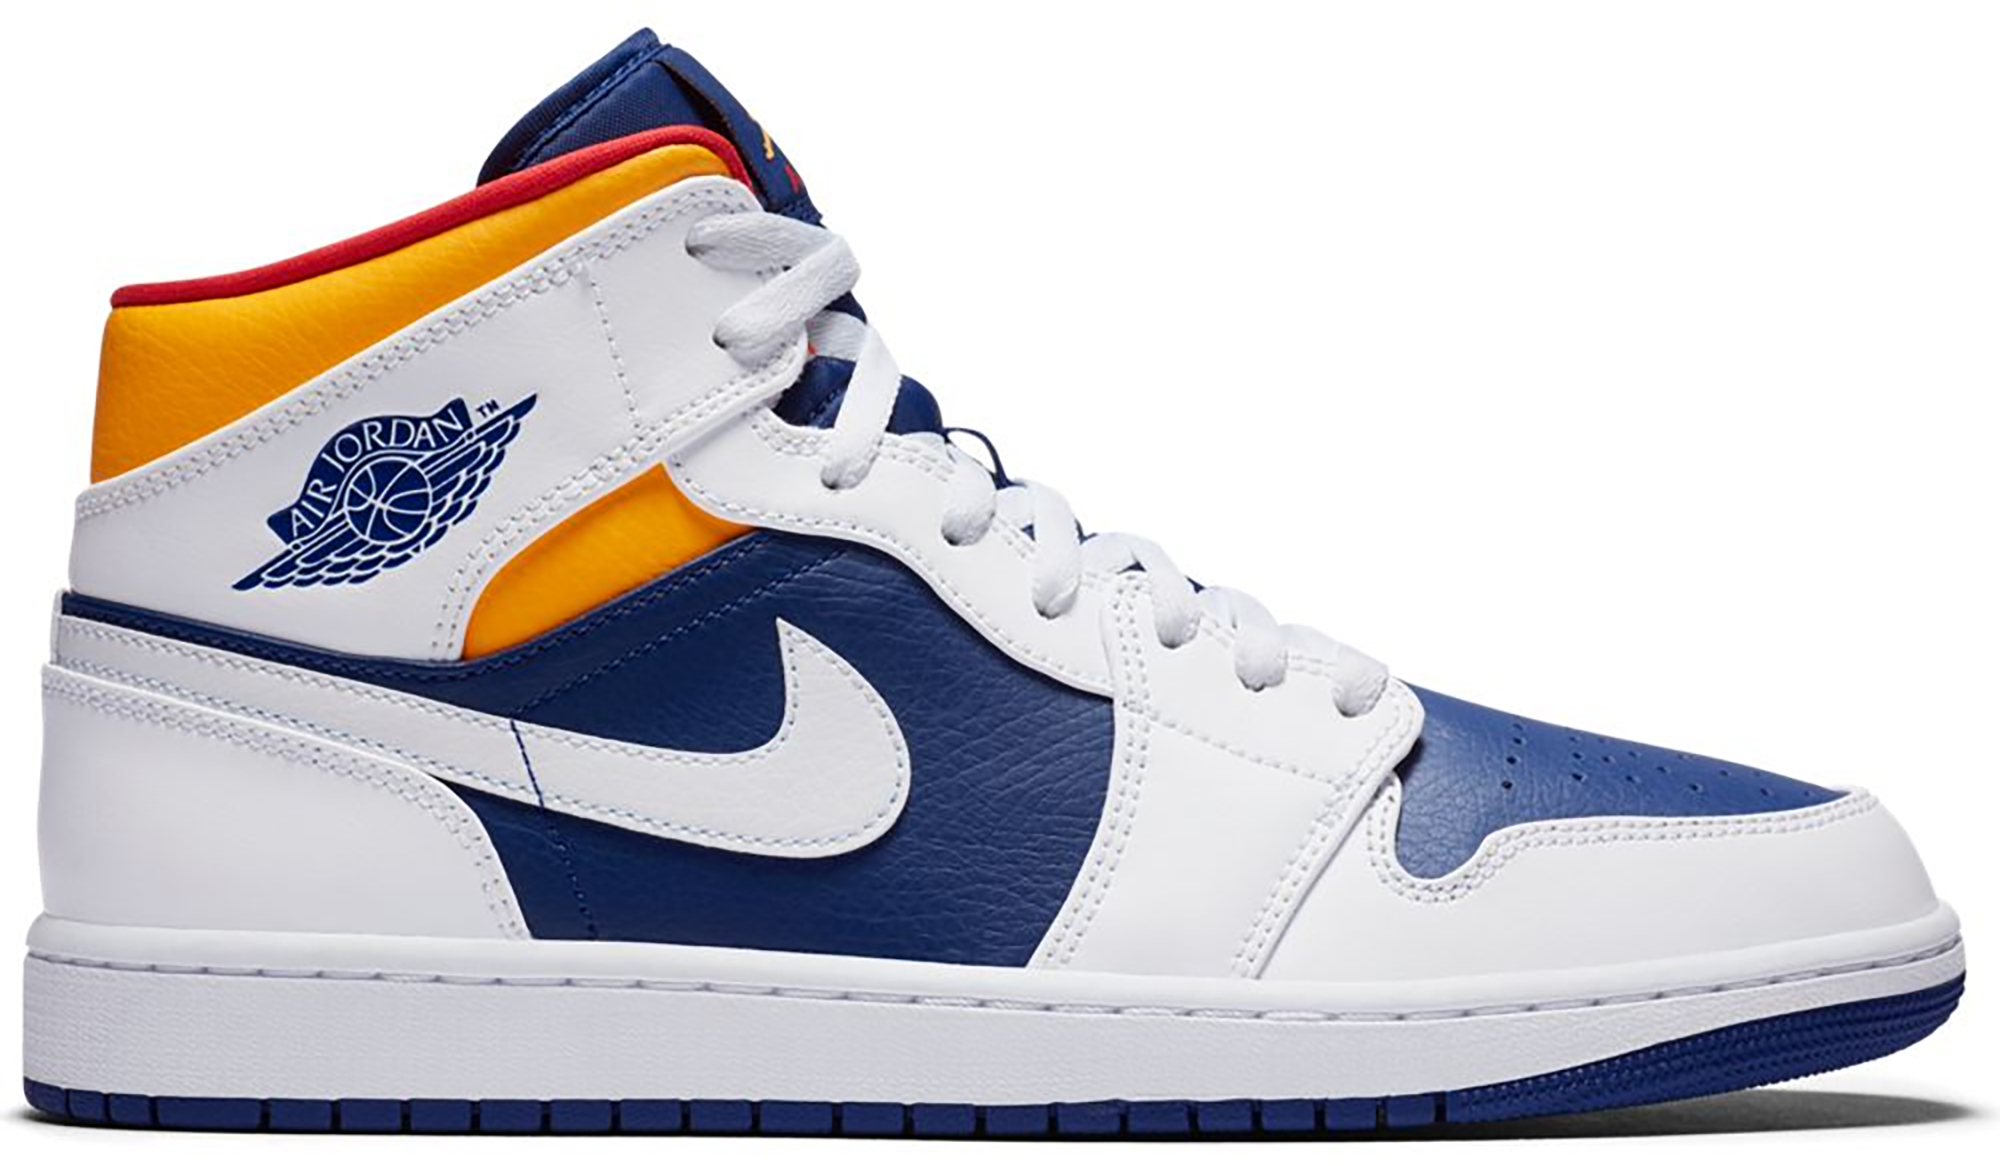 Jordan 1 Mid Royal Blue Laser Orange